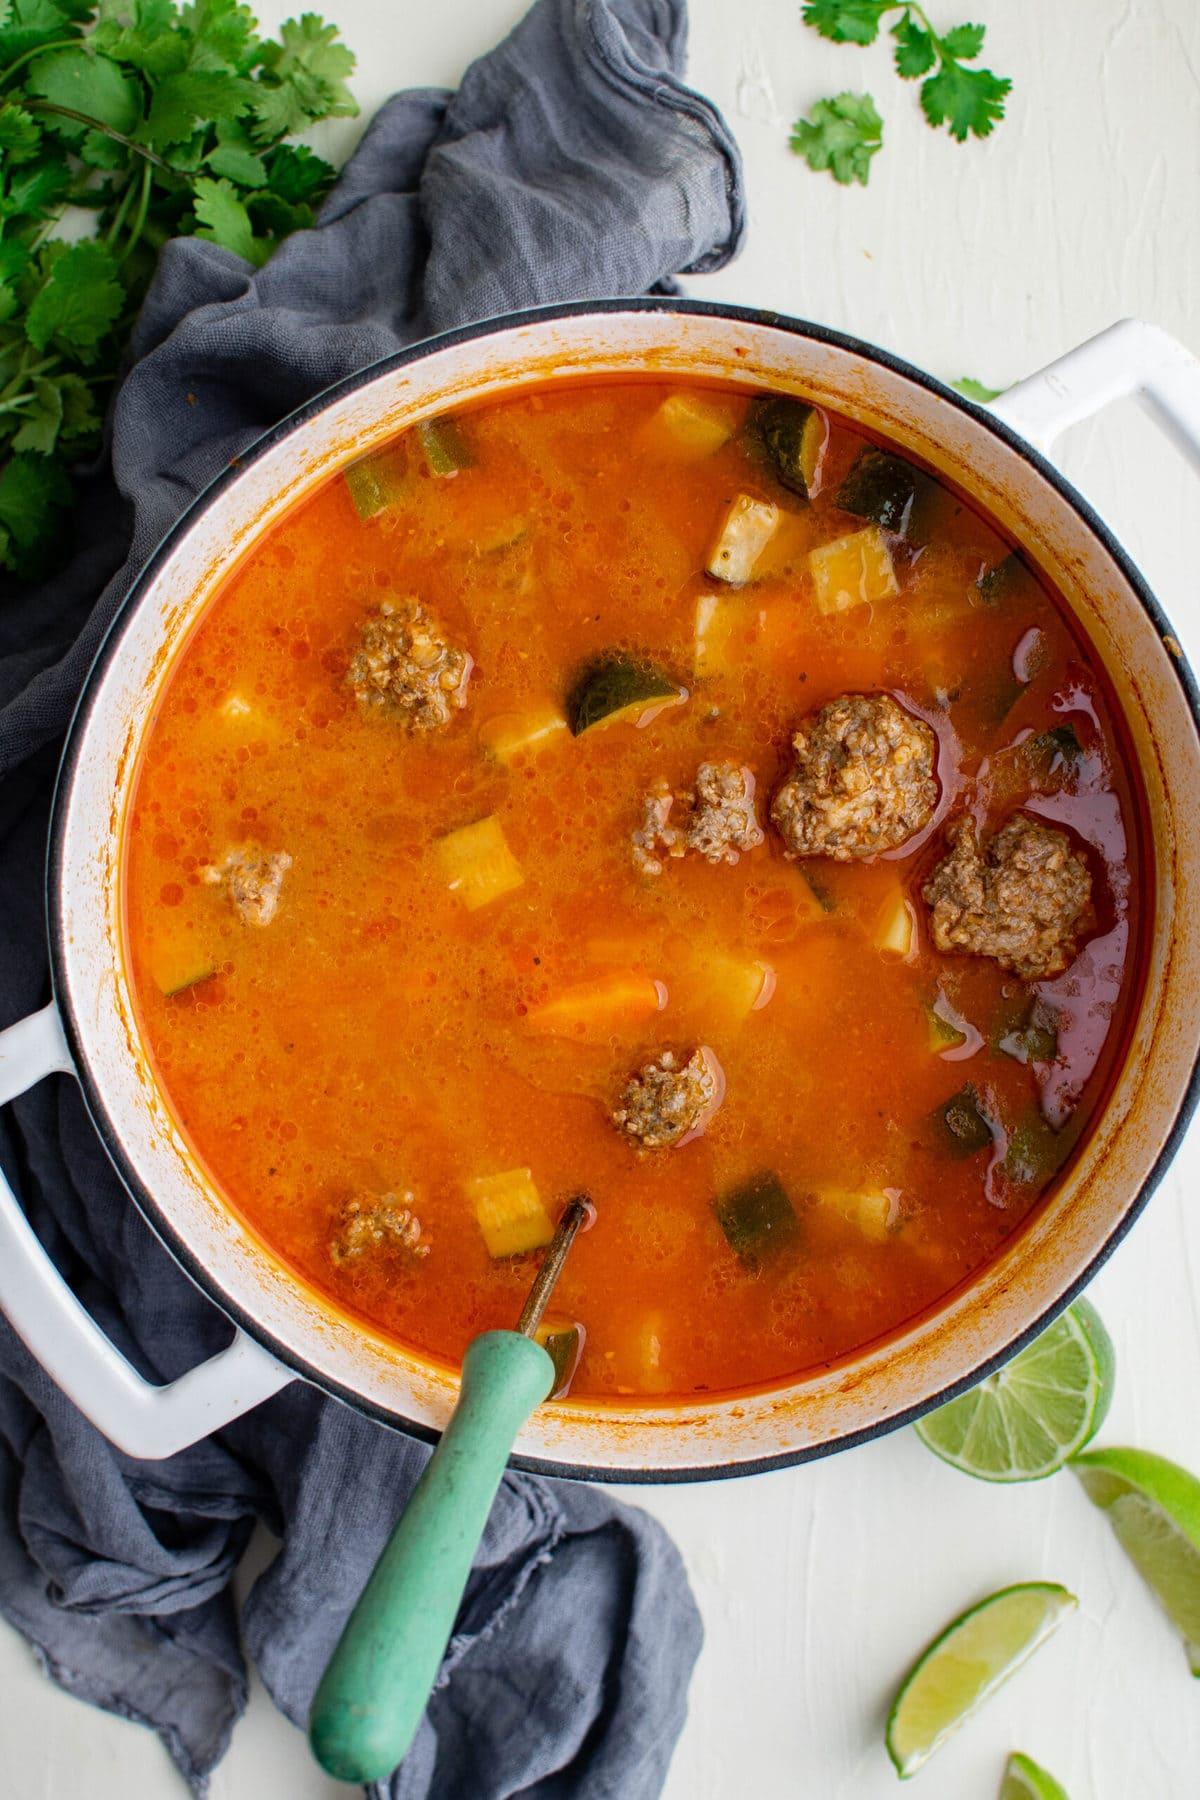 white soup pot, ladle, blue napkin, cilantro, limes, albondigas soup